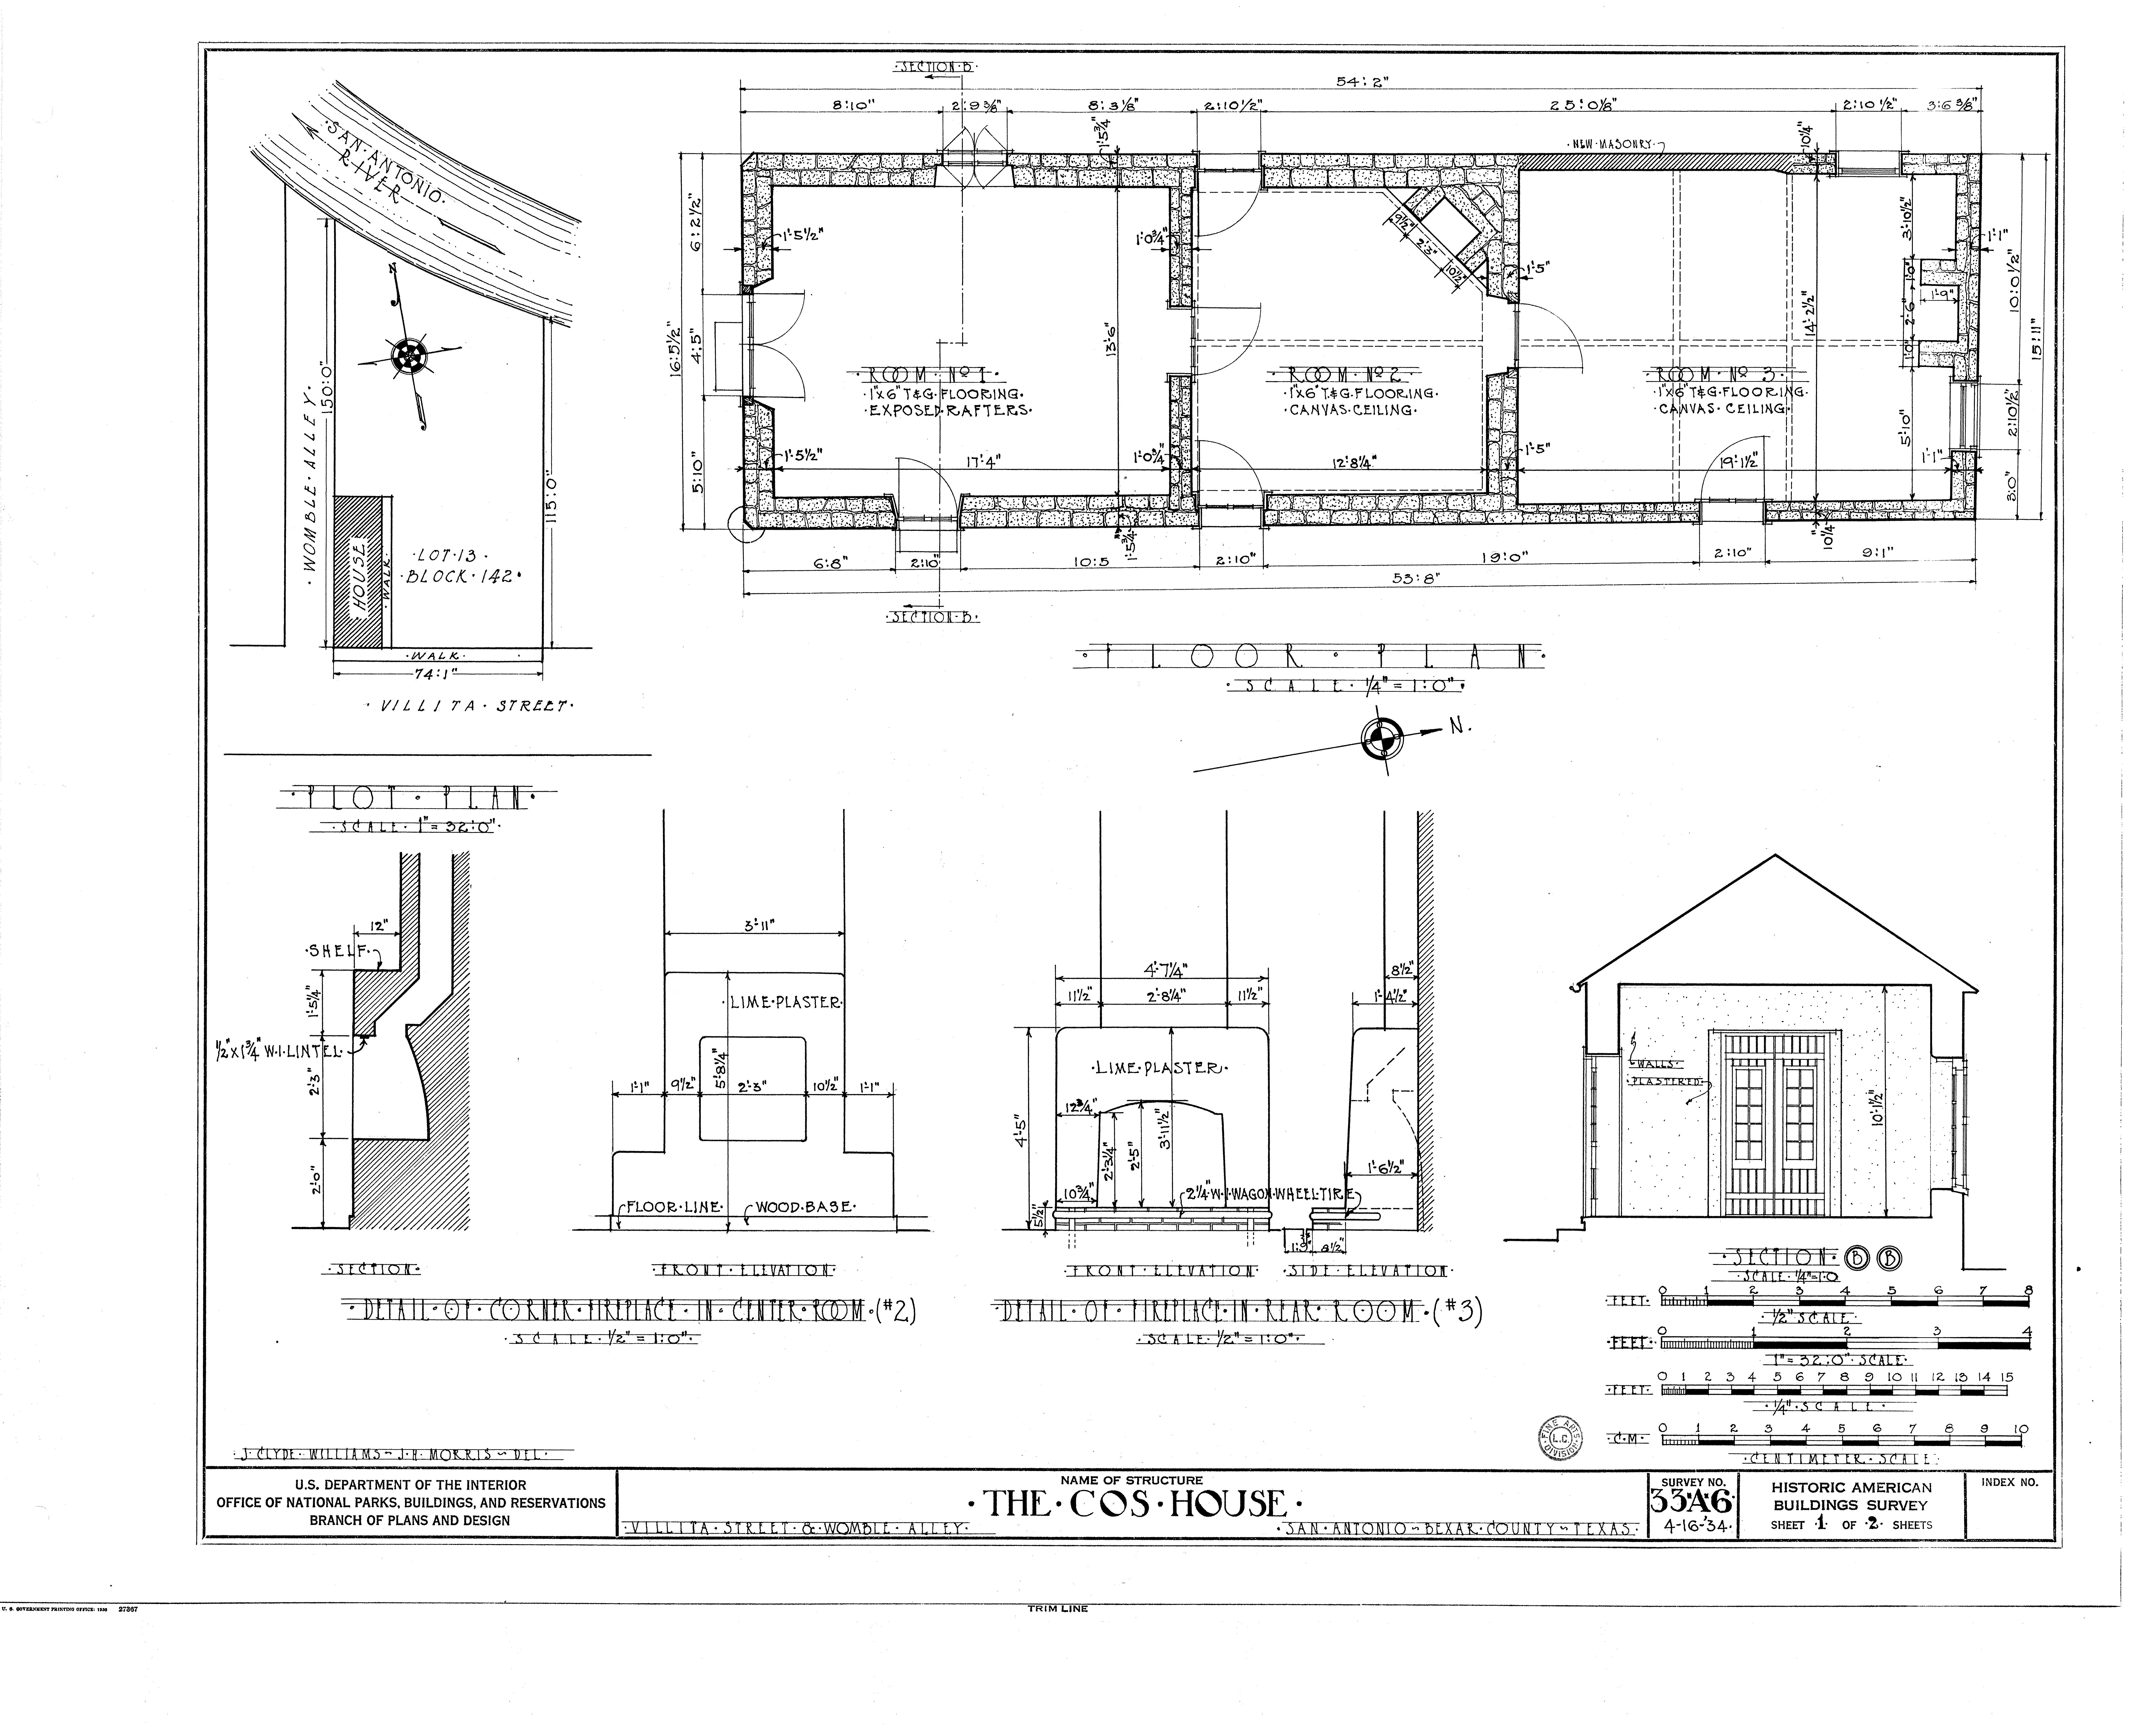 File:Cos House, 513 Paseo de la Villita, San Antonio, Bexar